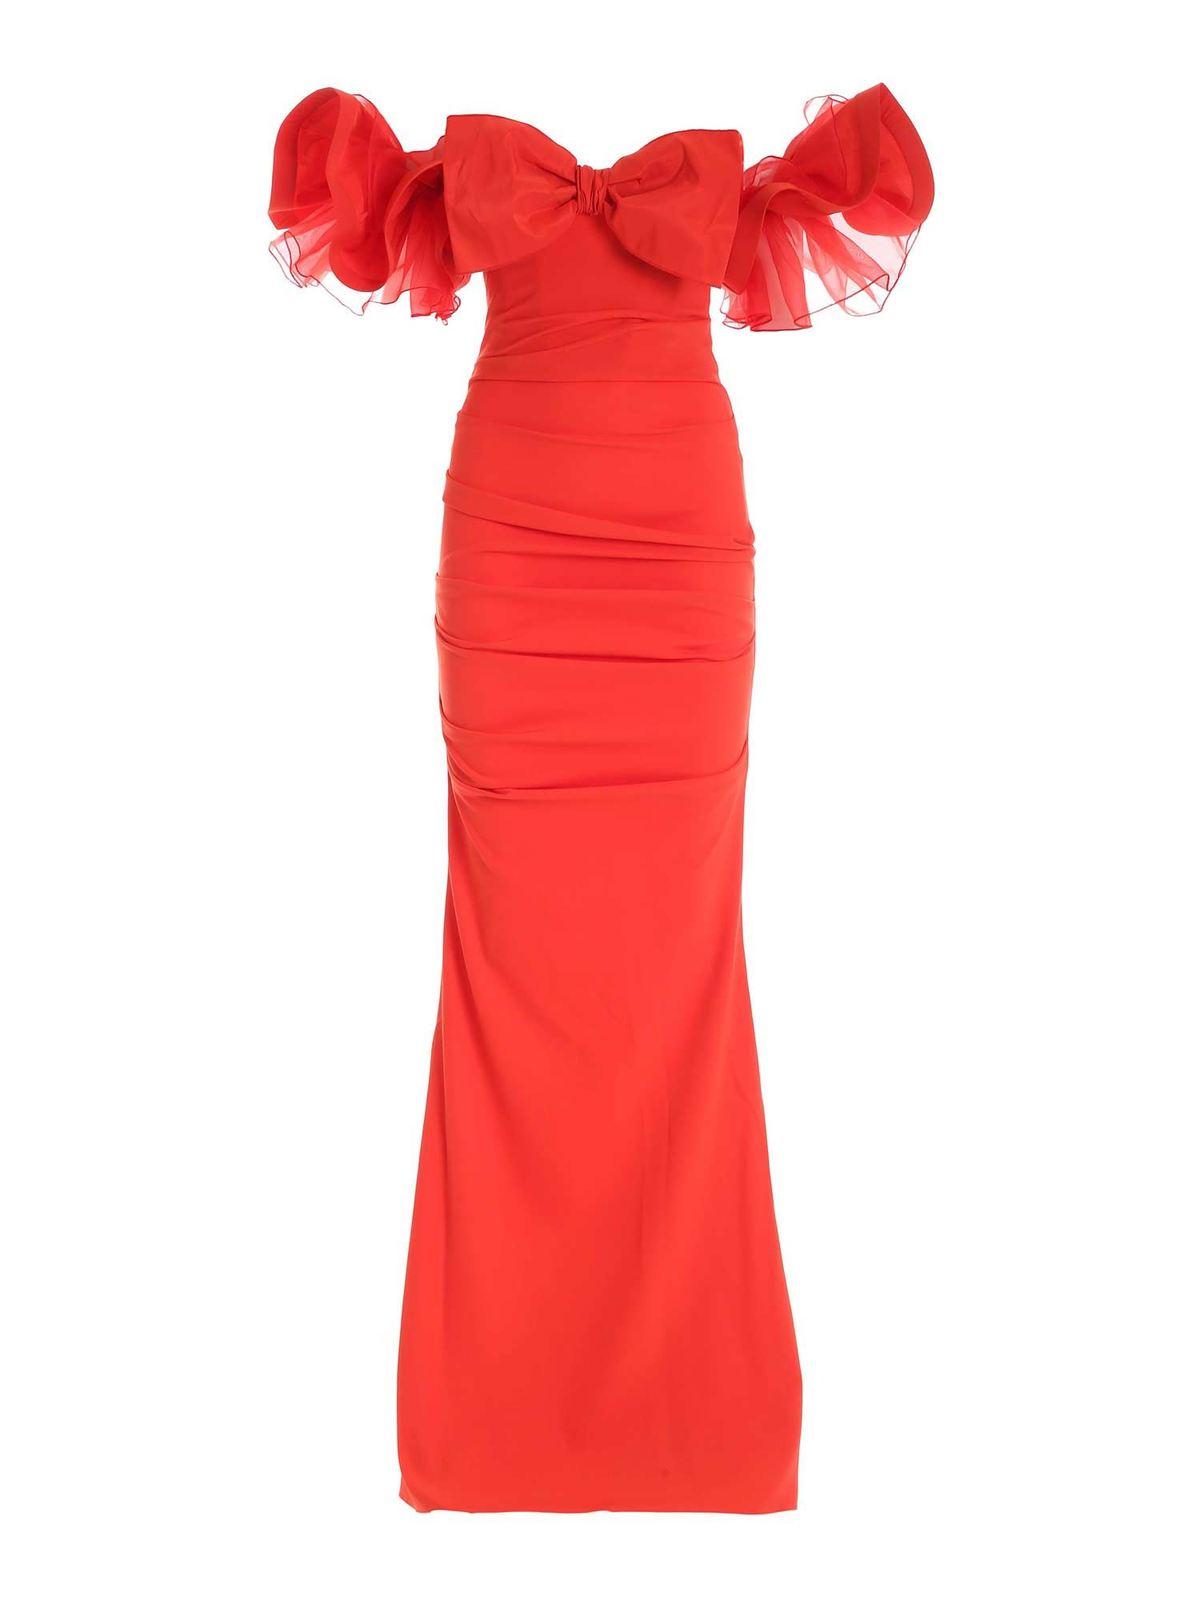 Elisabetta Franchi OFF SHOULDER RED DRESS FEATURING RUFFLES